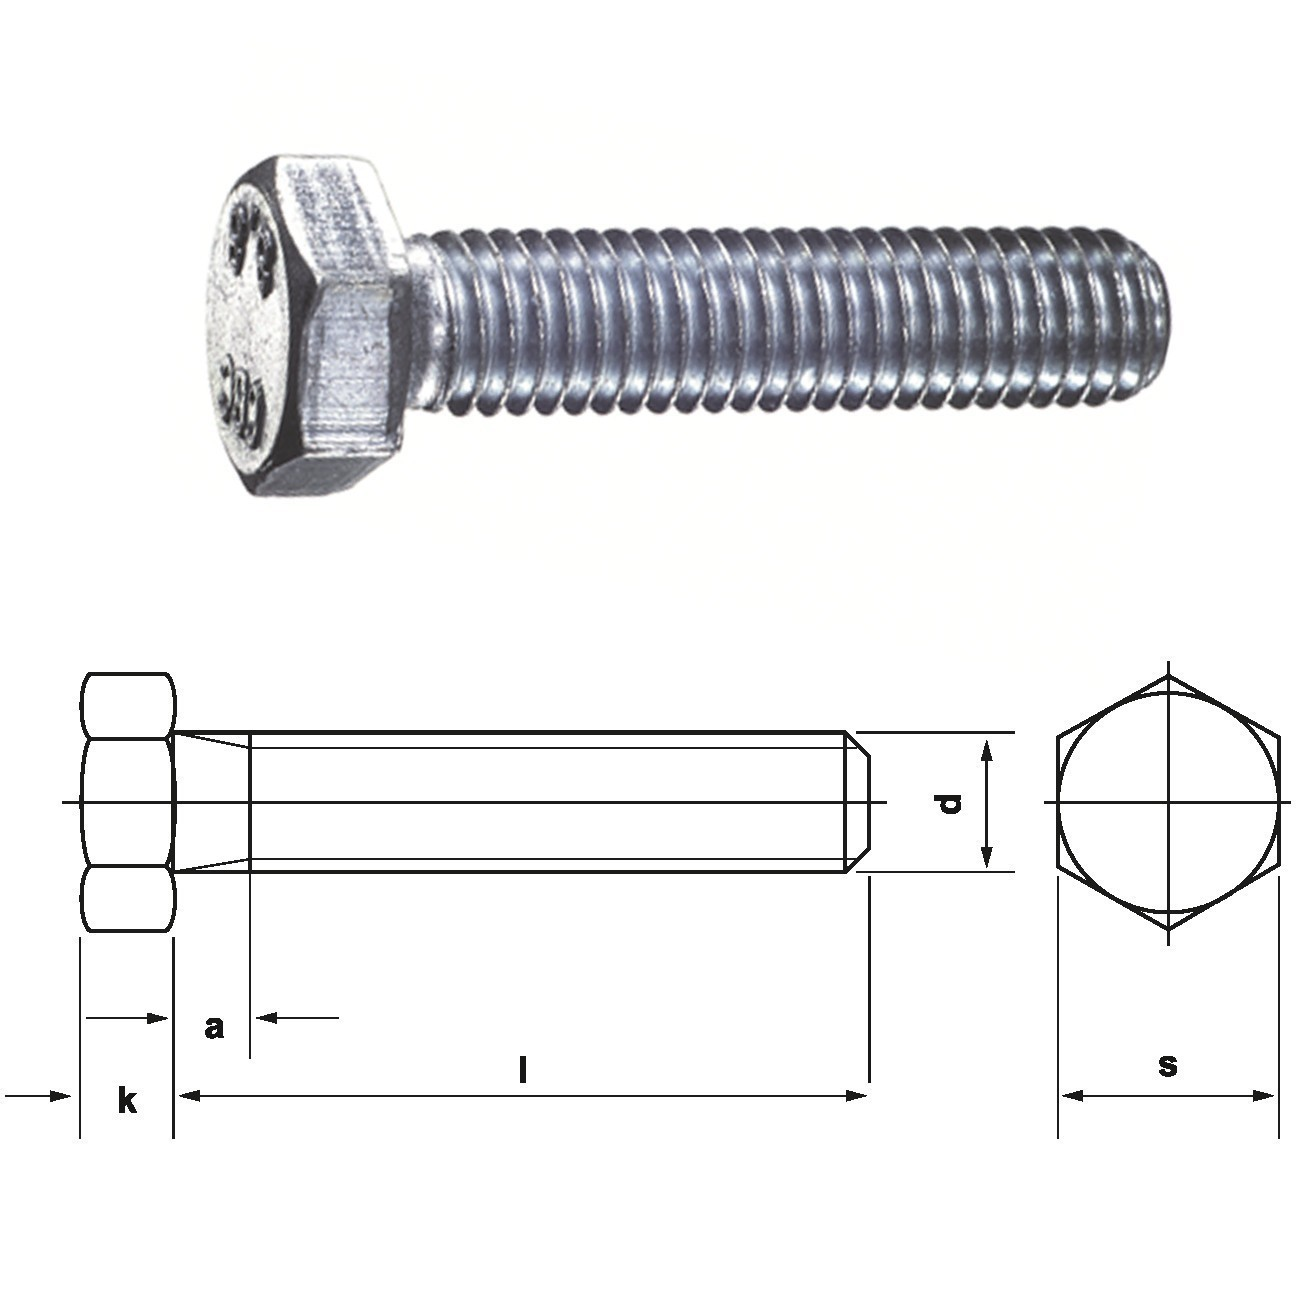 10 Stk Sechskantschraube DIN 933 8.8 M6 x 16 verzinkt